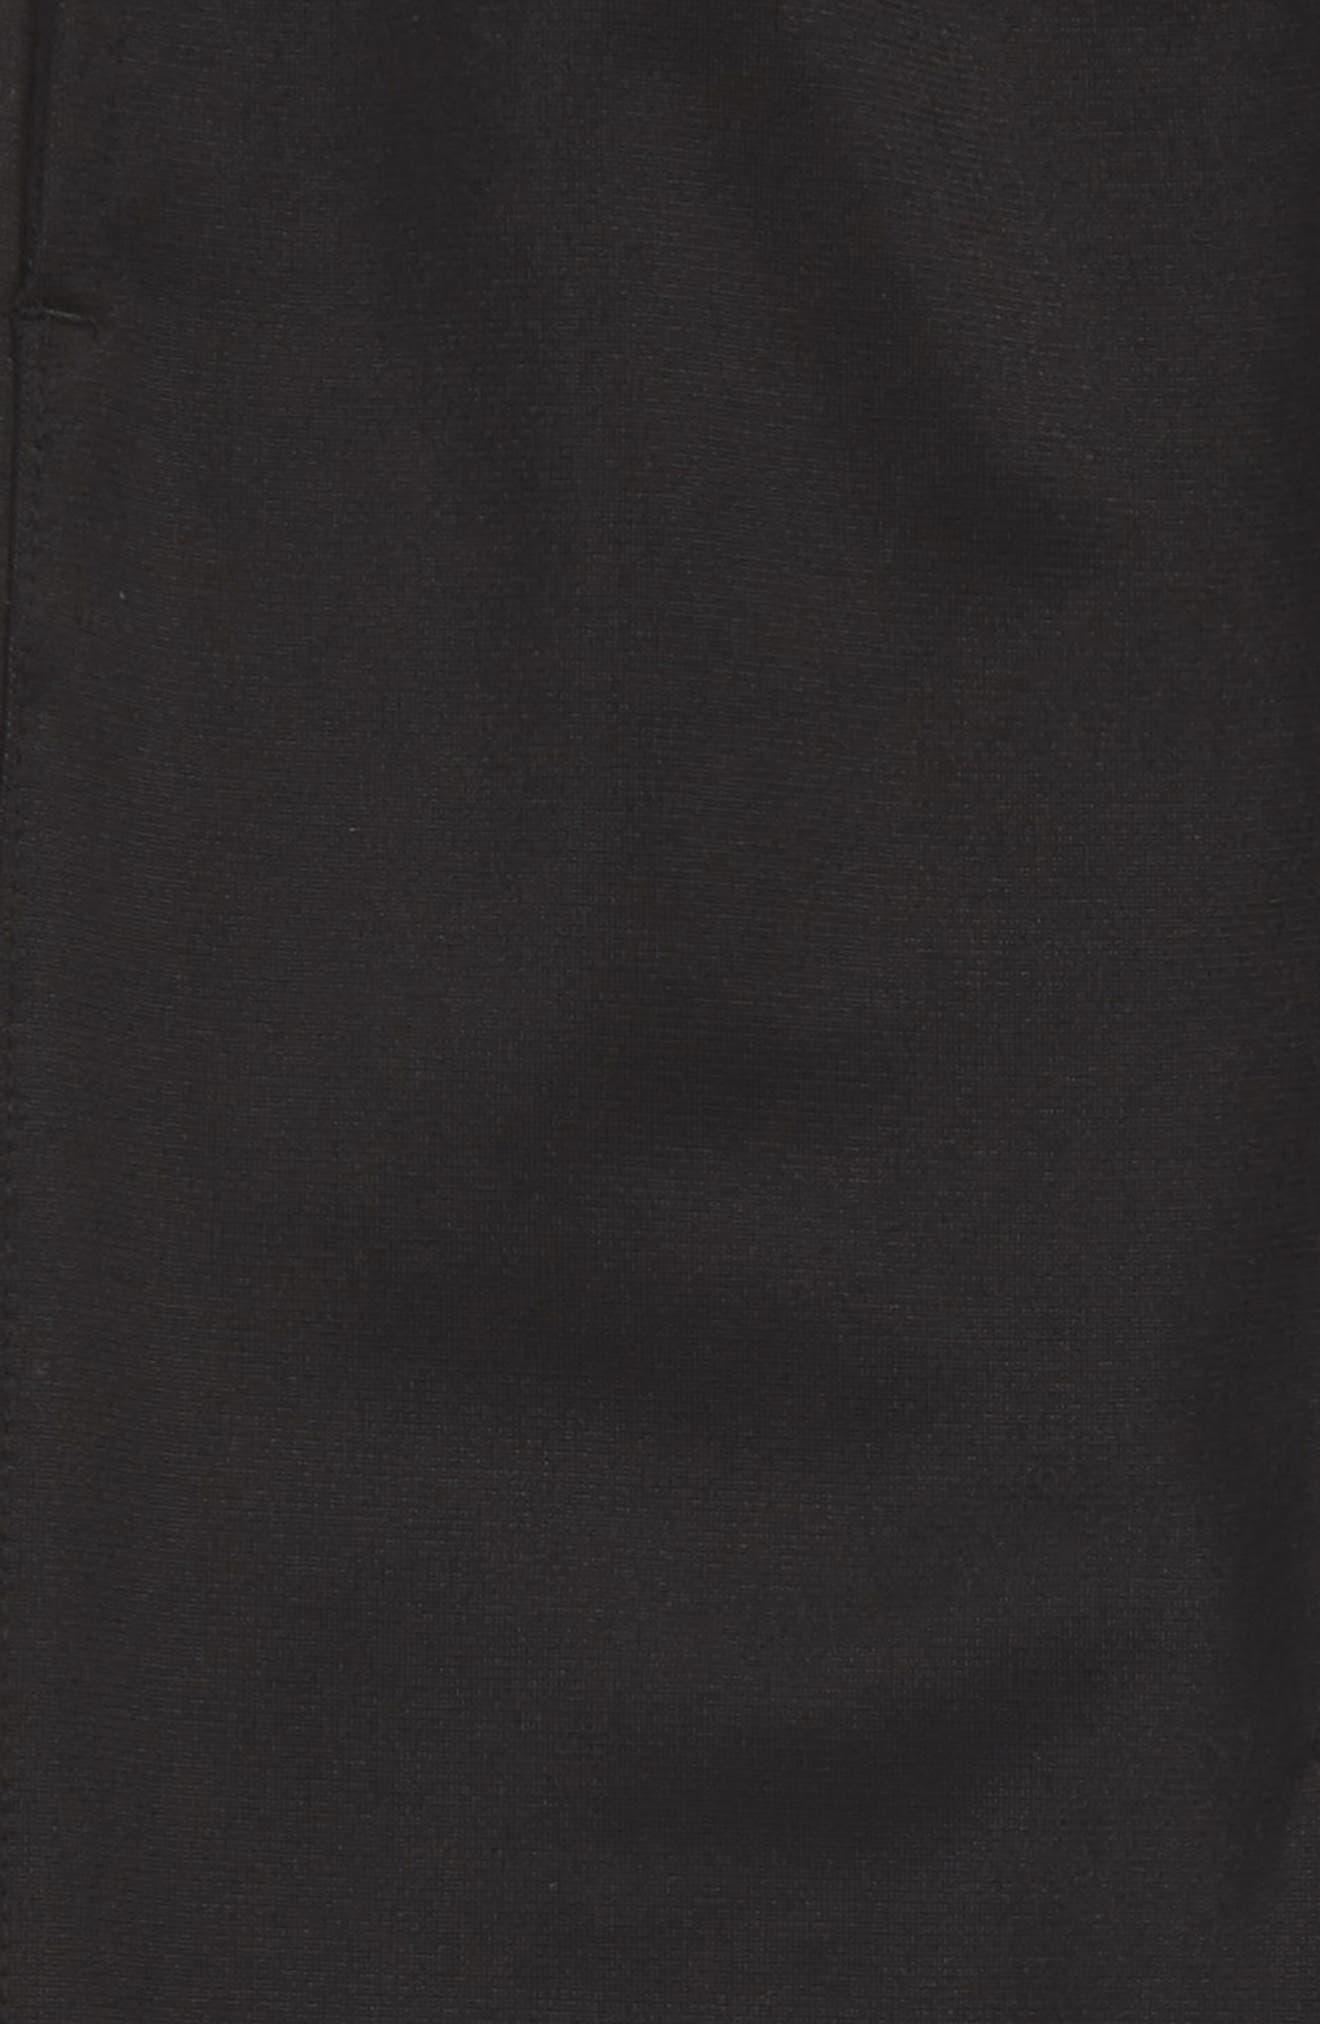 Pennant Sweatpants,                             Alternate thumbnail 2, color,                             Black/ Graphite